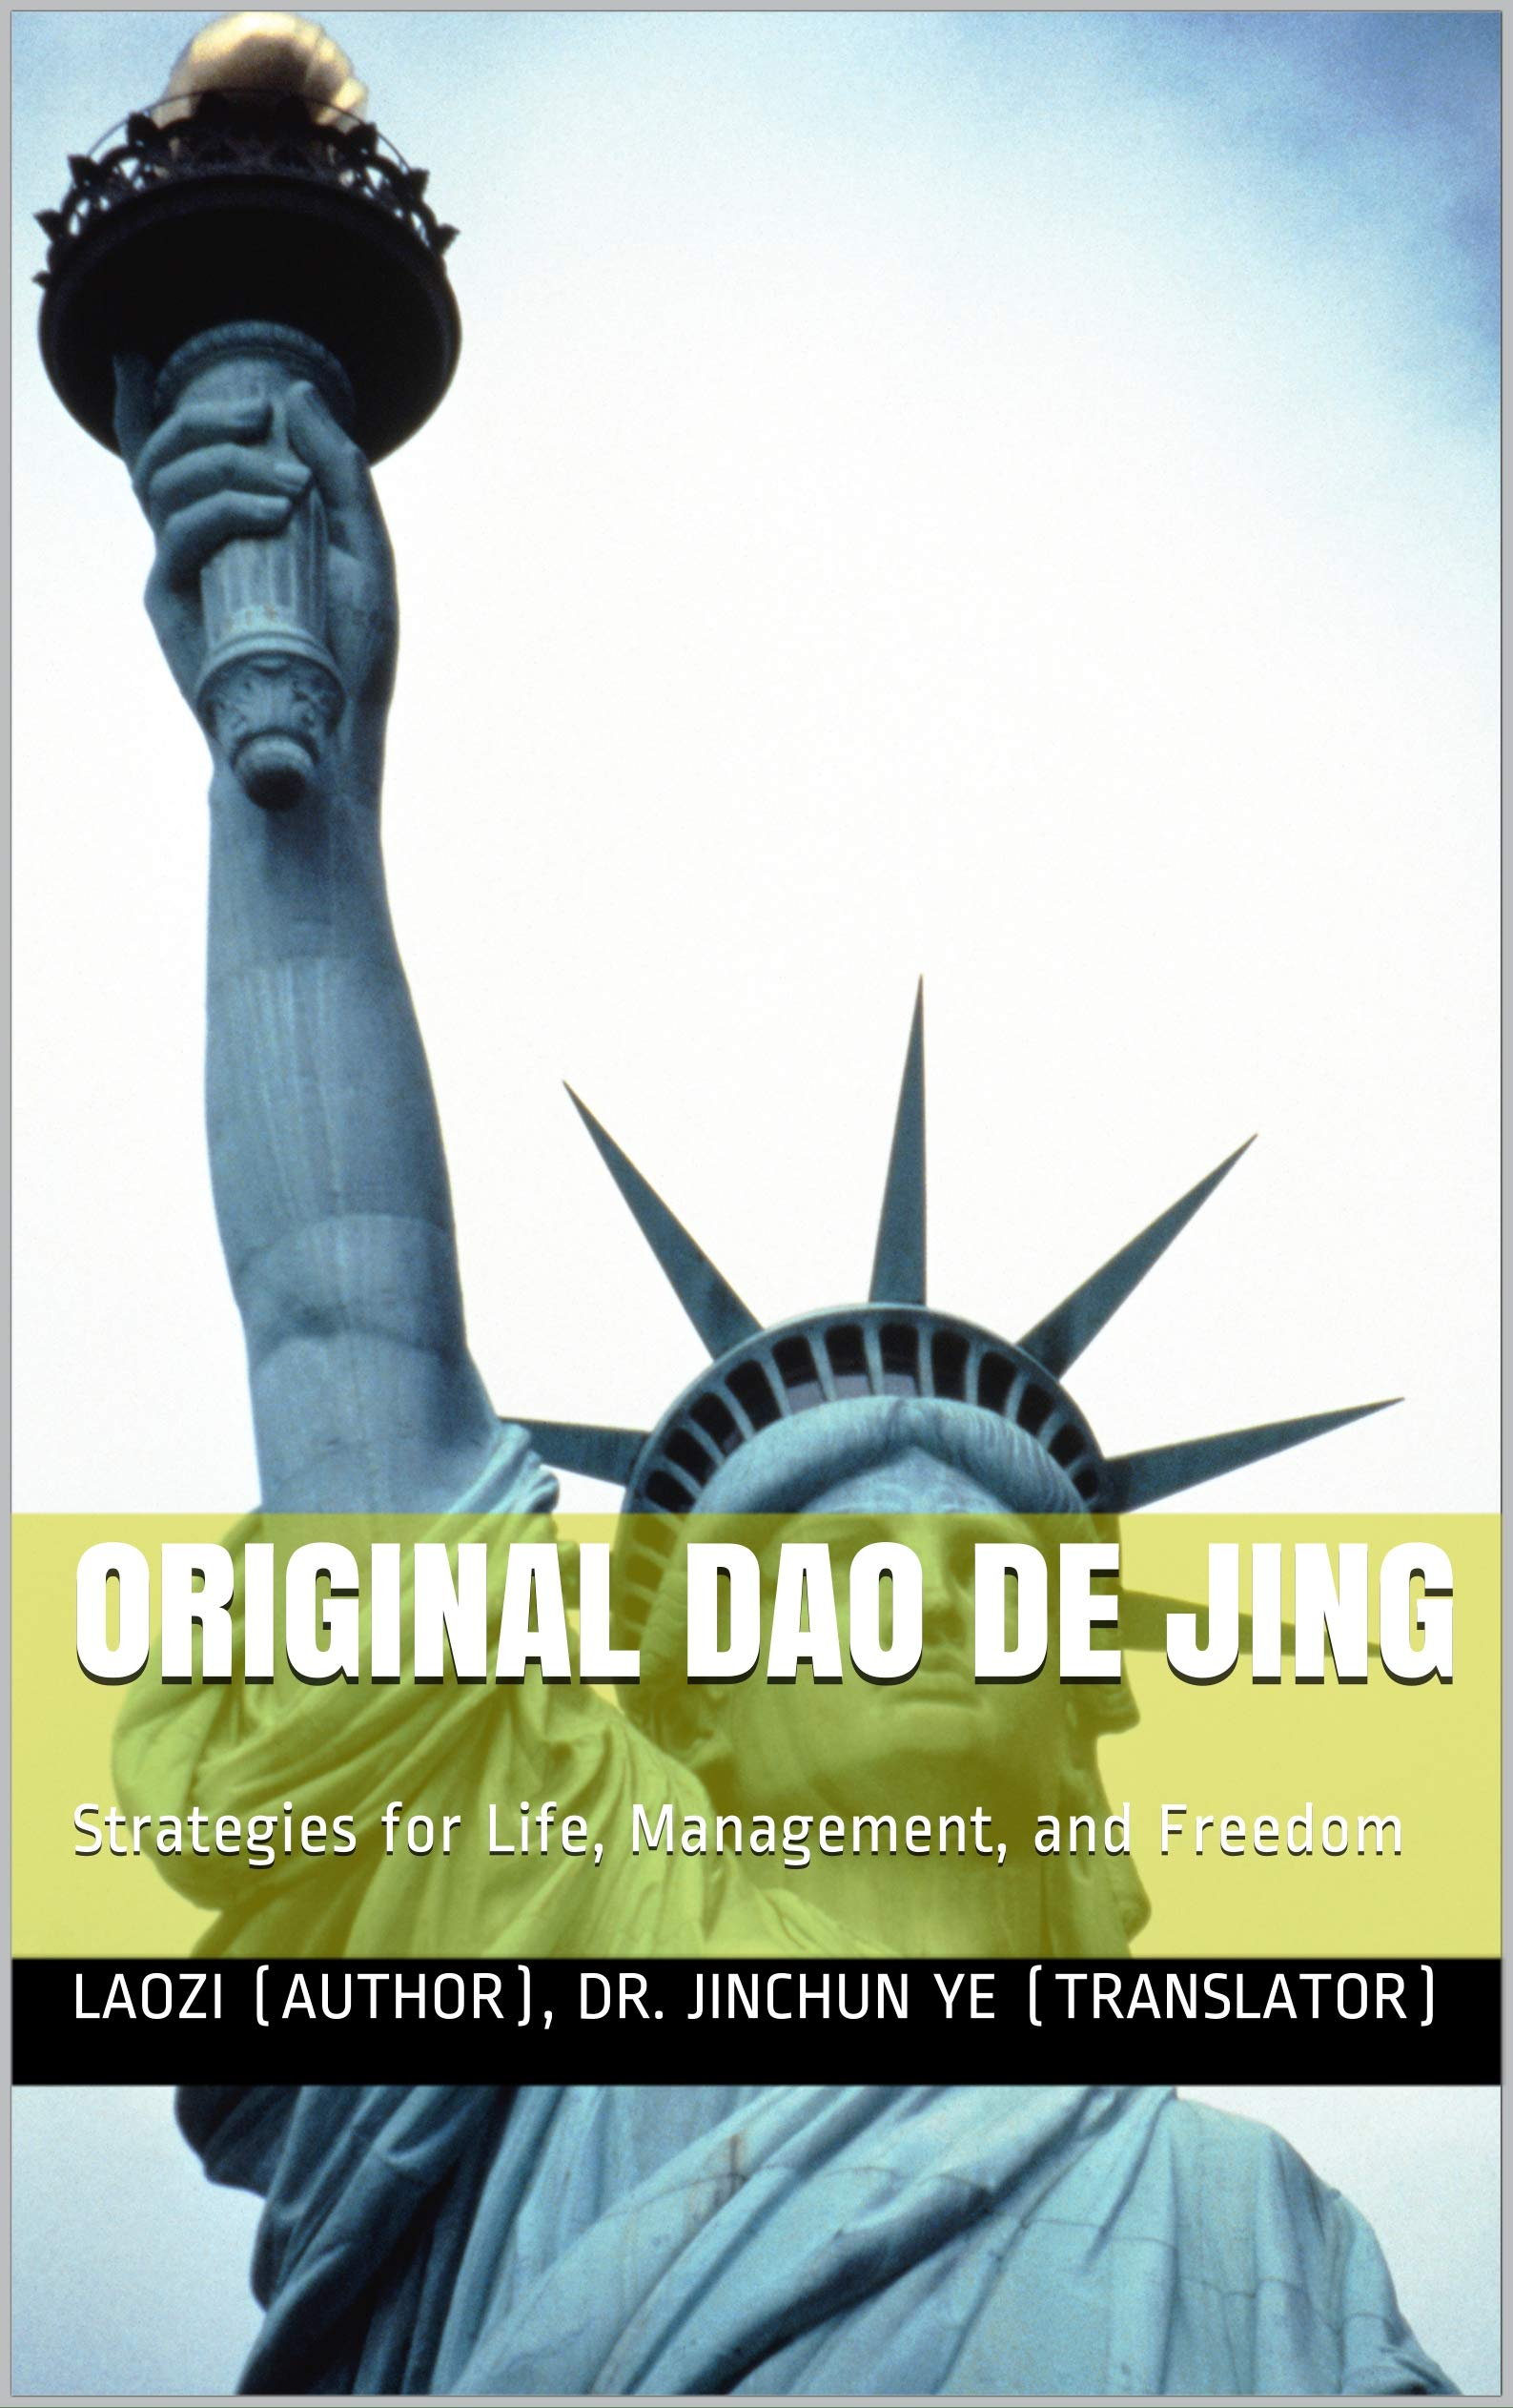 ORIGINAL DAO DE JING: Strategies for Life, Management, and Freedom